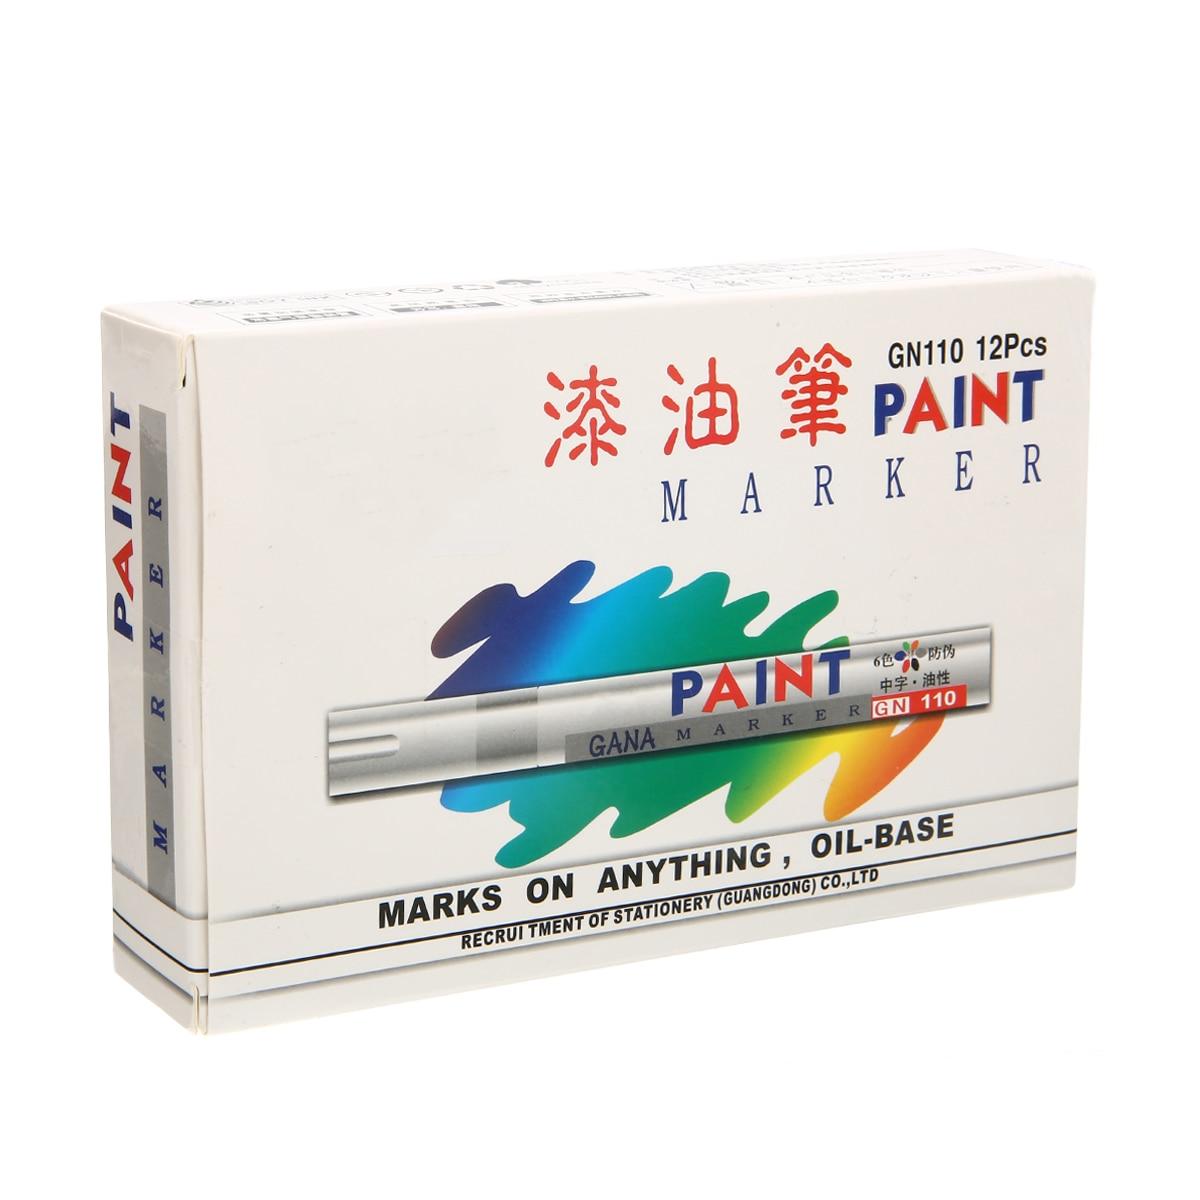 12 Piece Waterproof Car Tyre Tire Tread Permanent Paint Marker Pens White Graffiti Oily Marker Office School Stationery Gifts